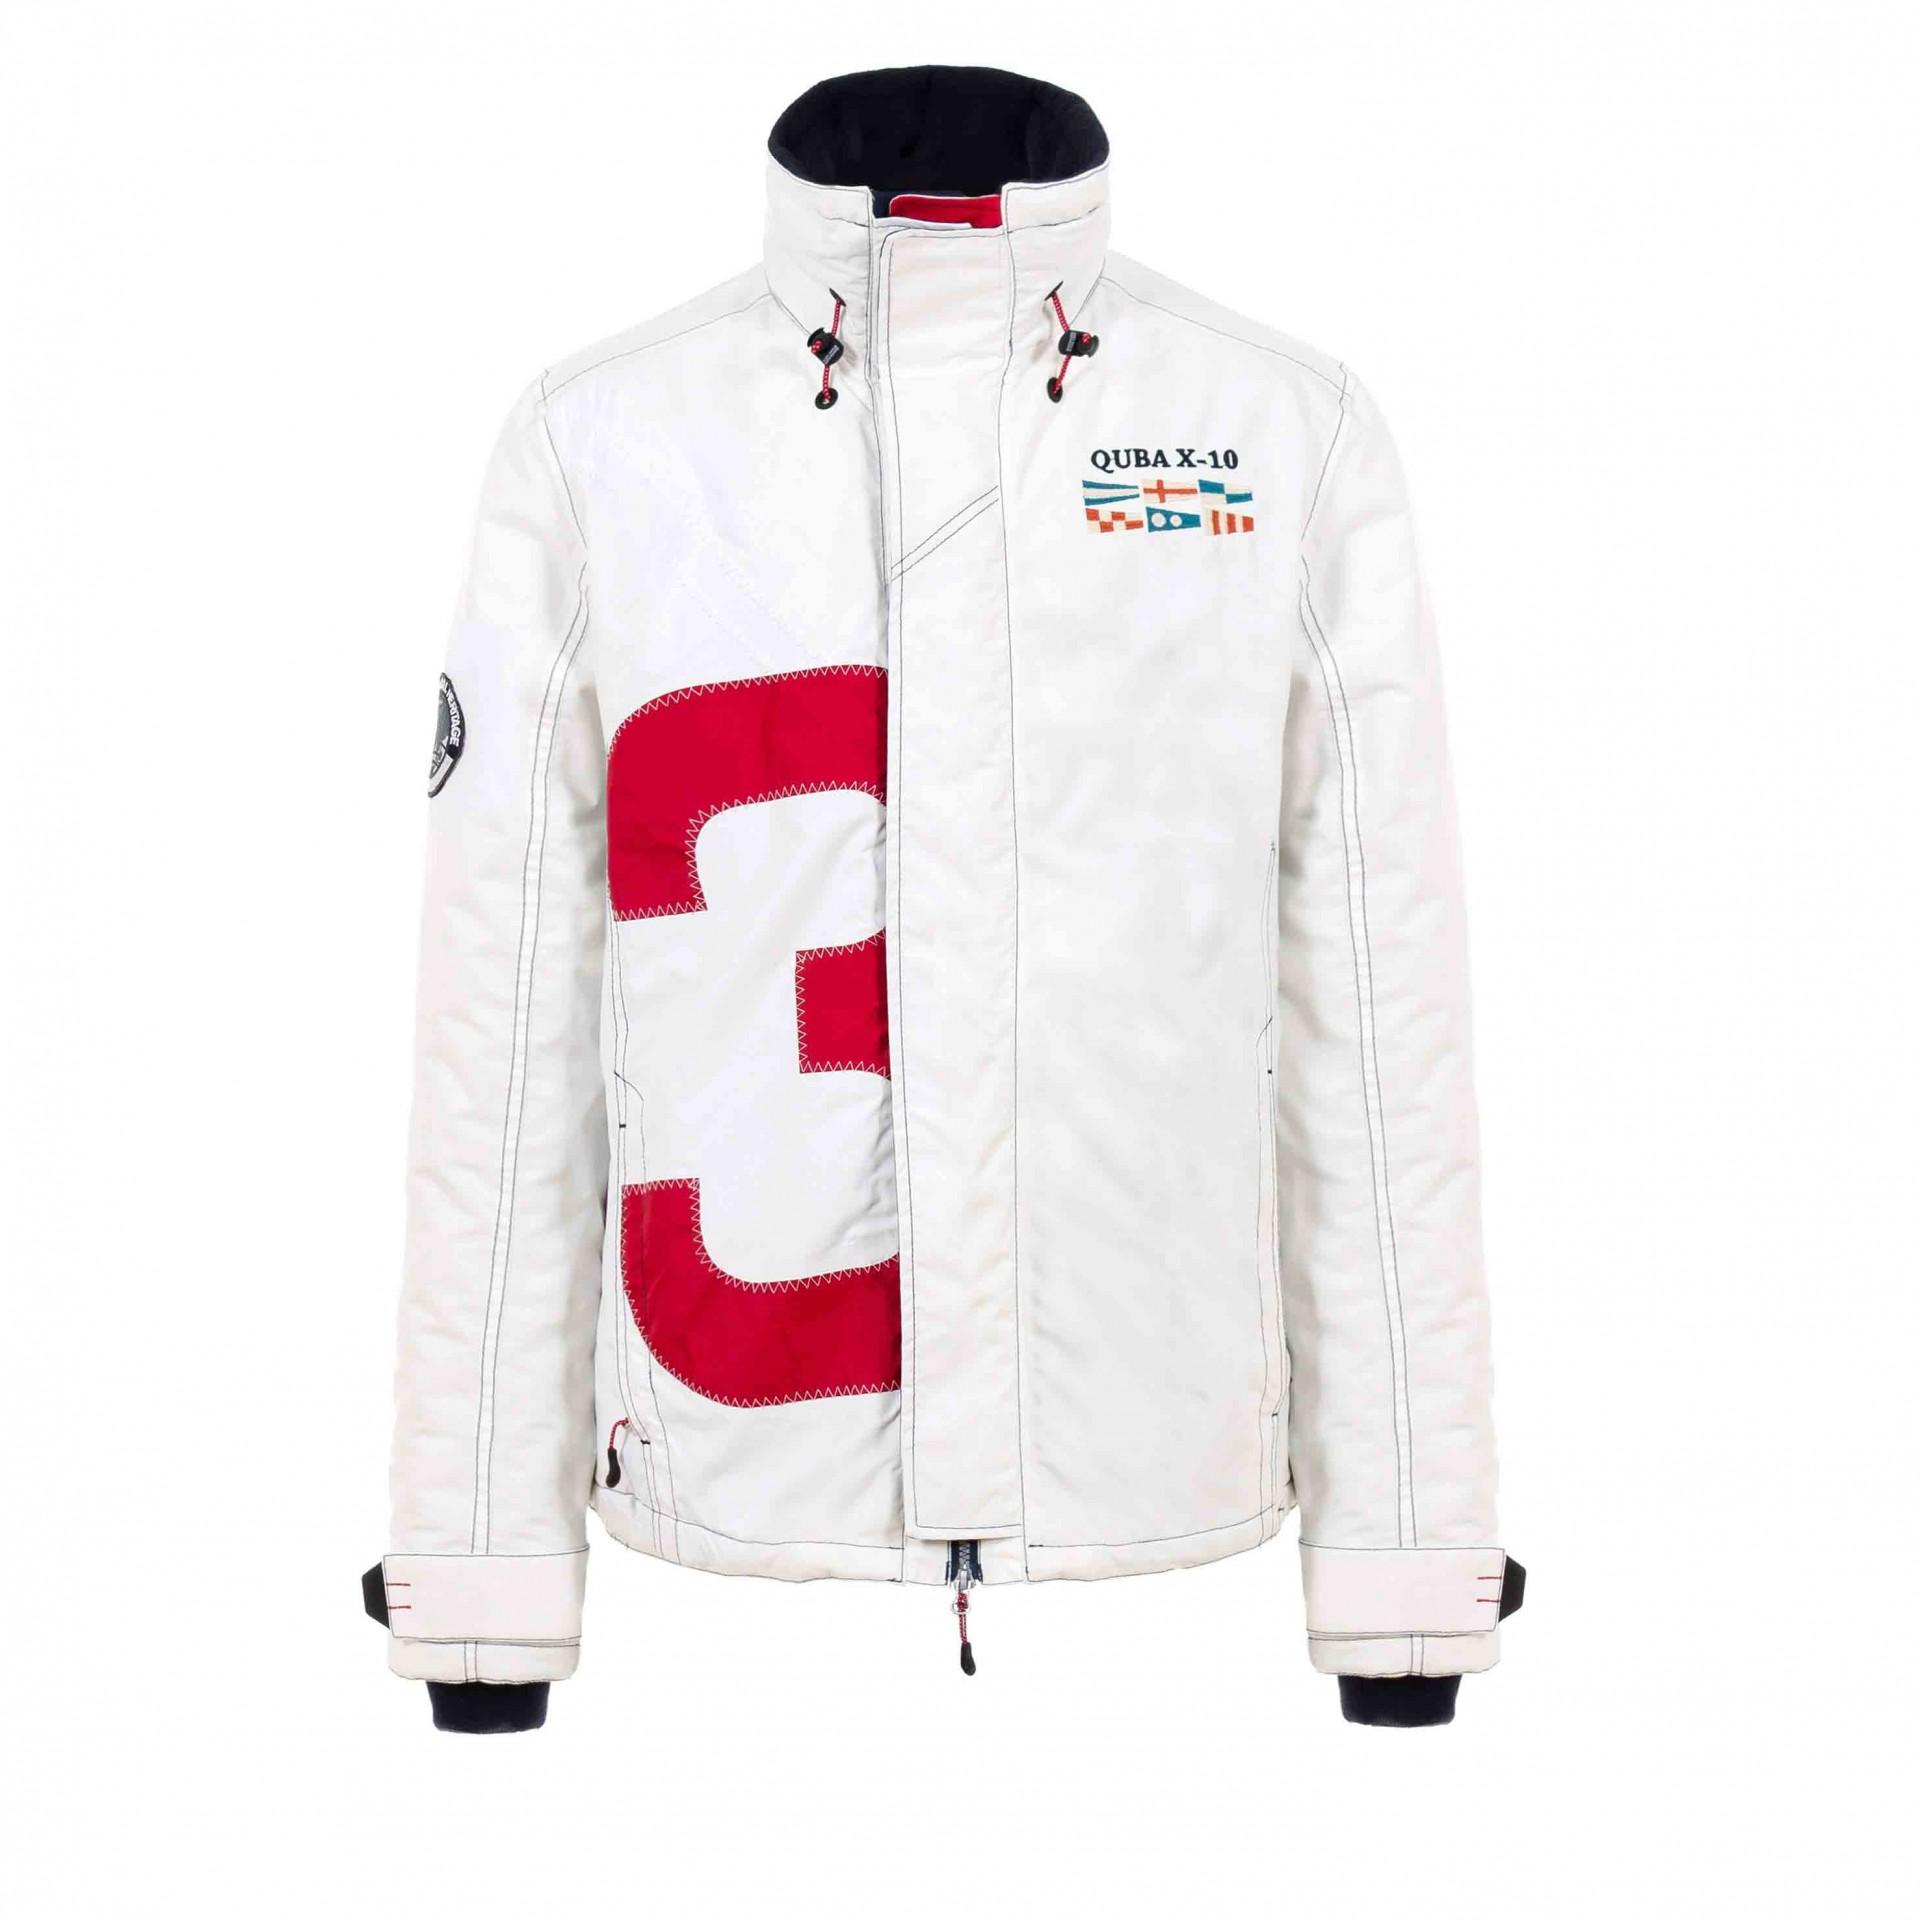 X-10 Men's Jacket - White & Red, £250, www.quba.com